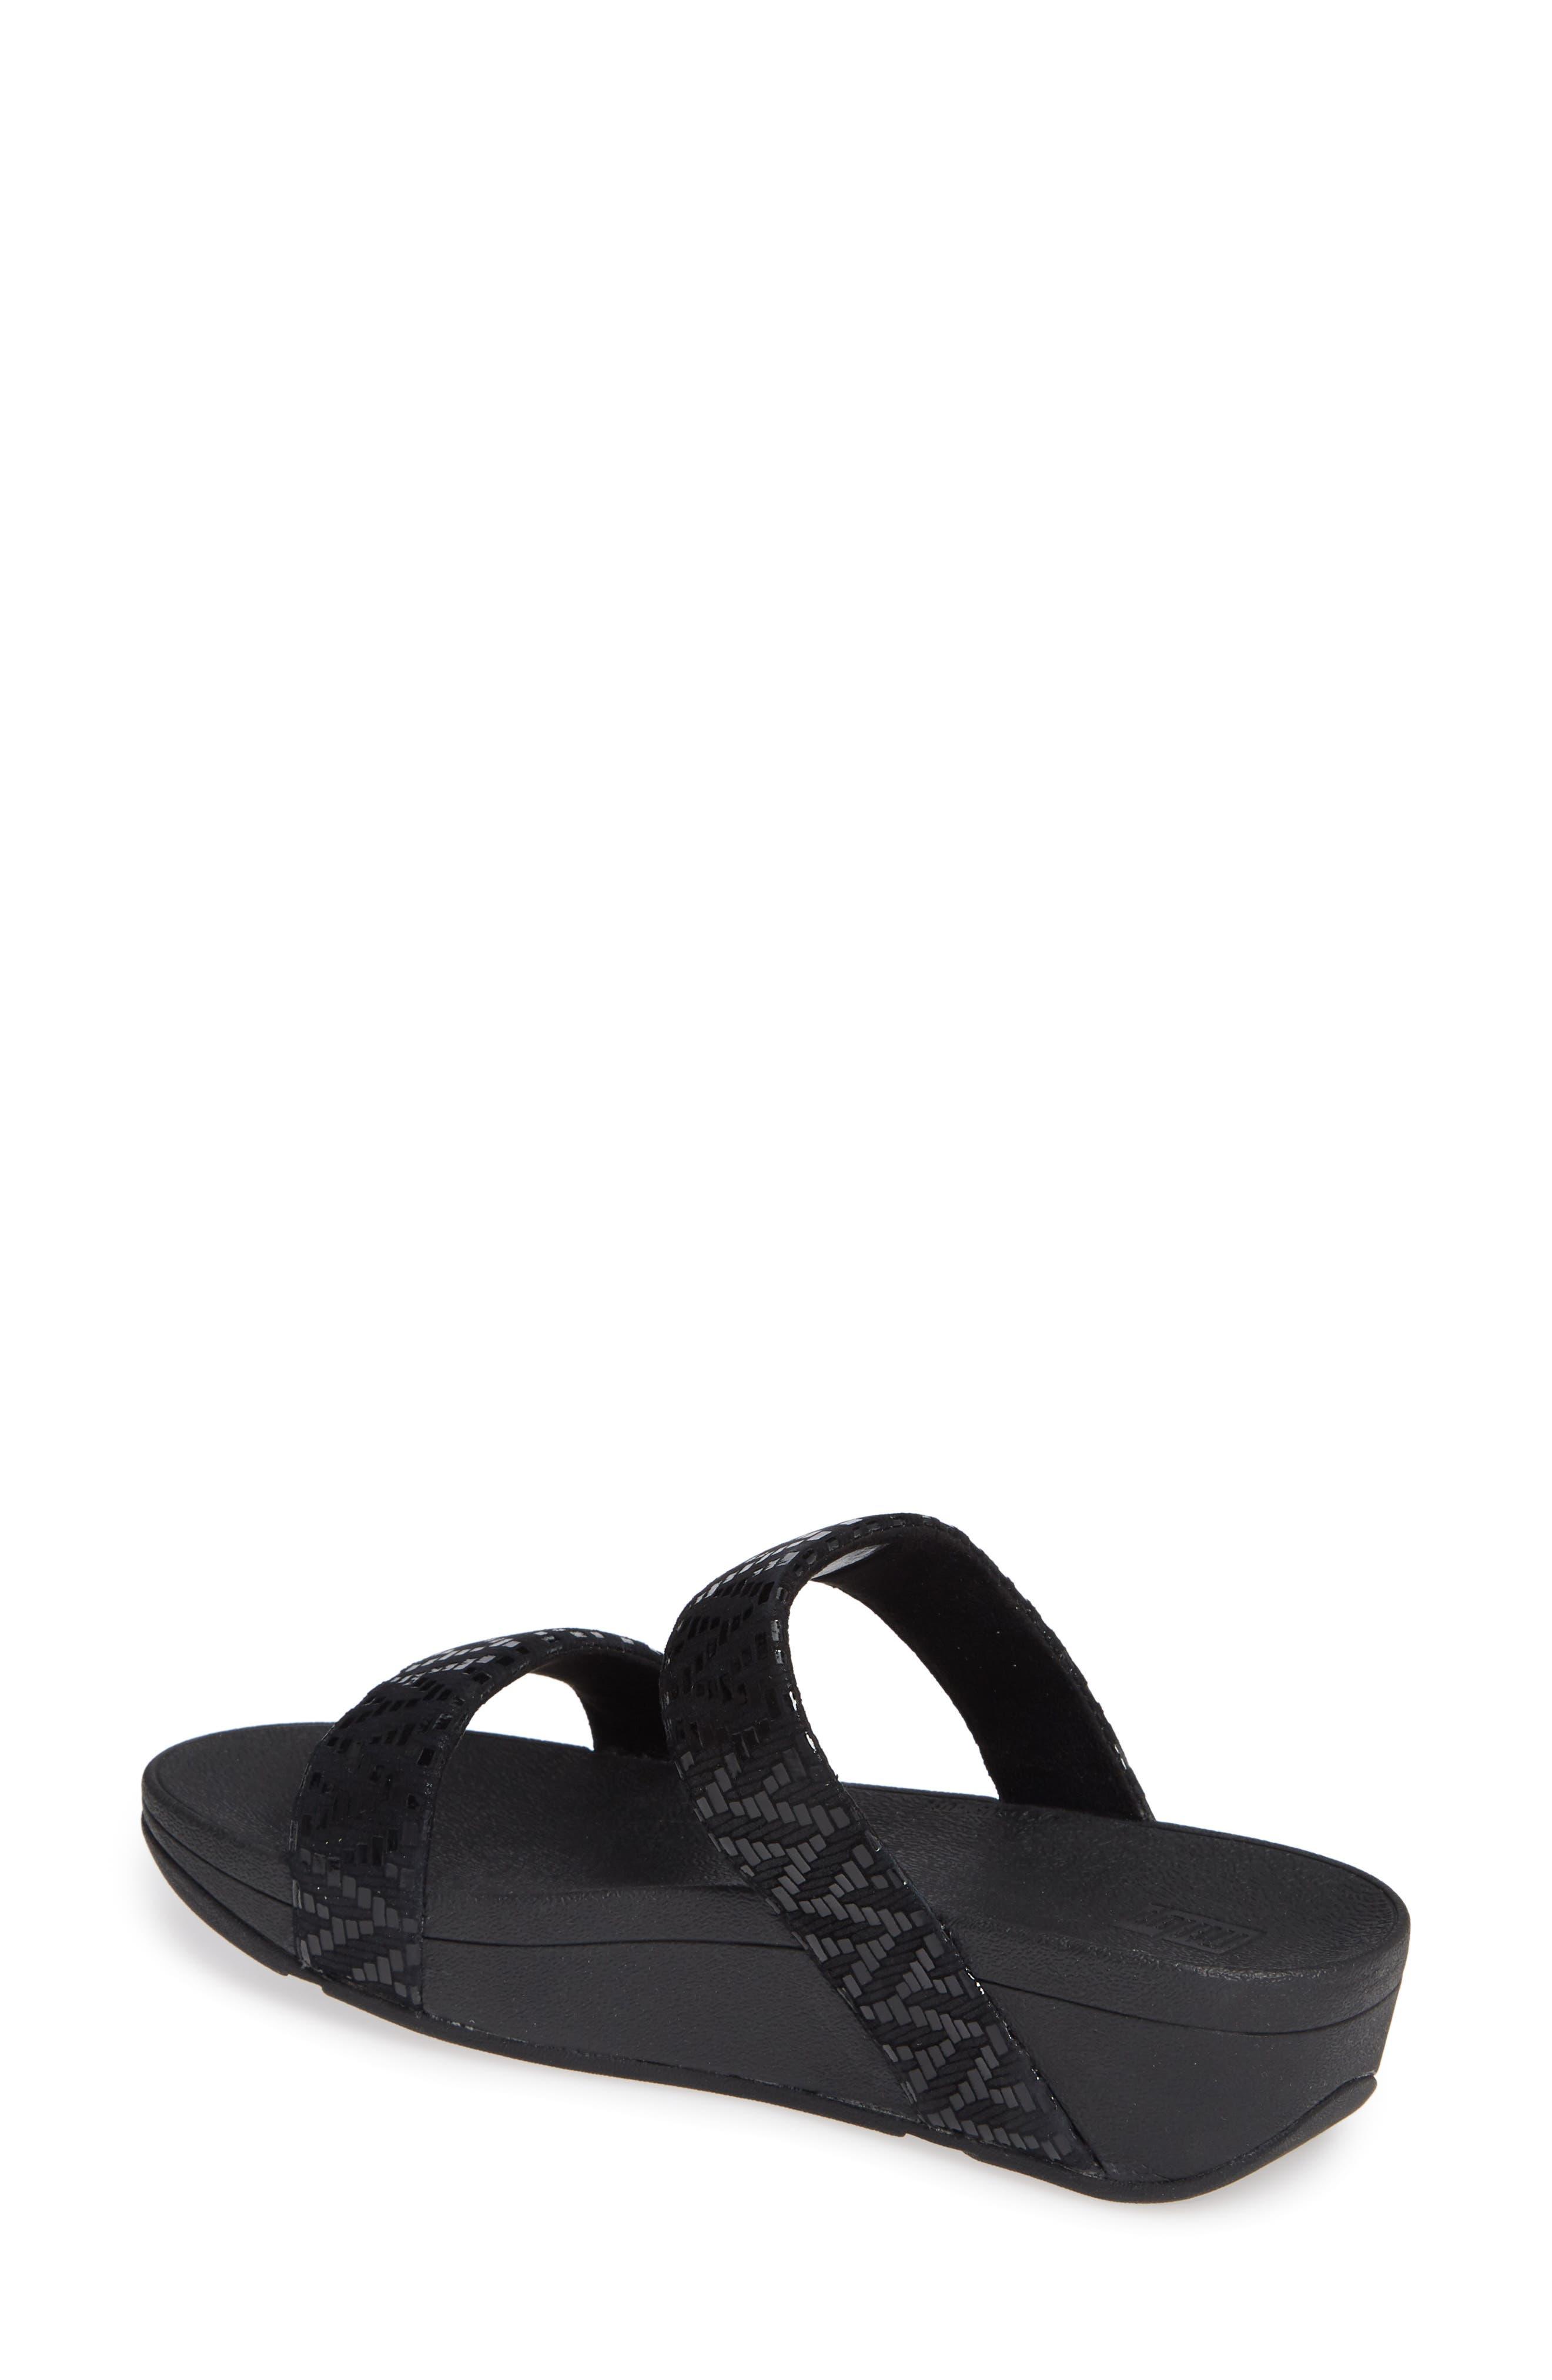 Lottie Chevron Wedge Slide Sandal,                             Alternate thumbnail 2, color,                             BLACK FABRIC